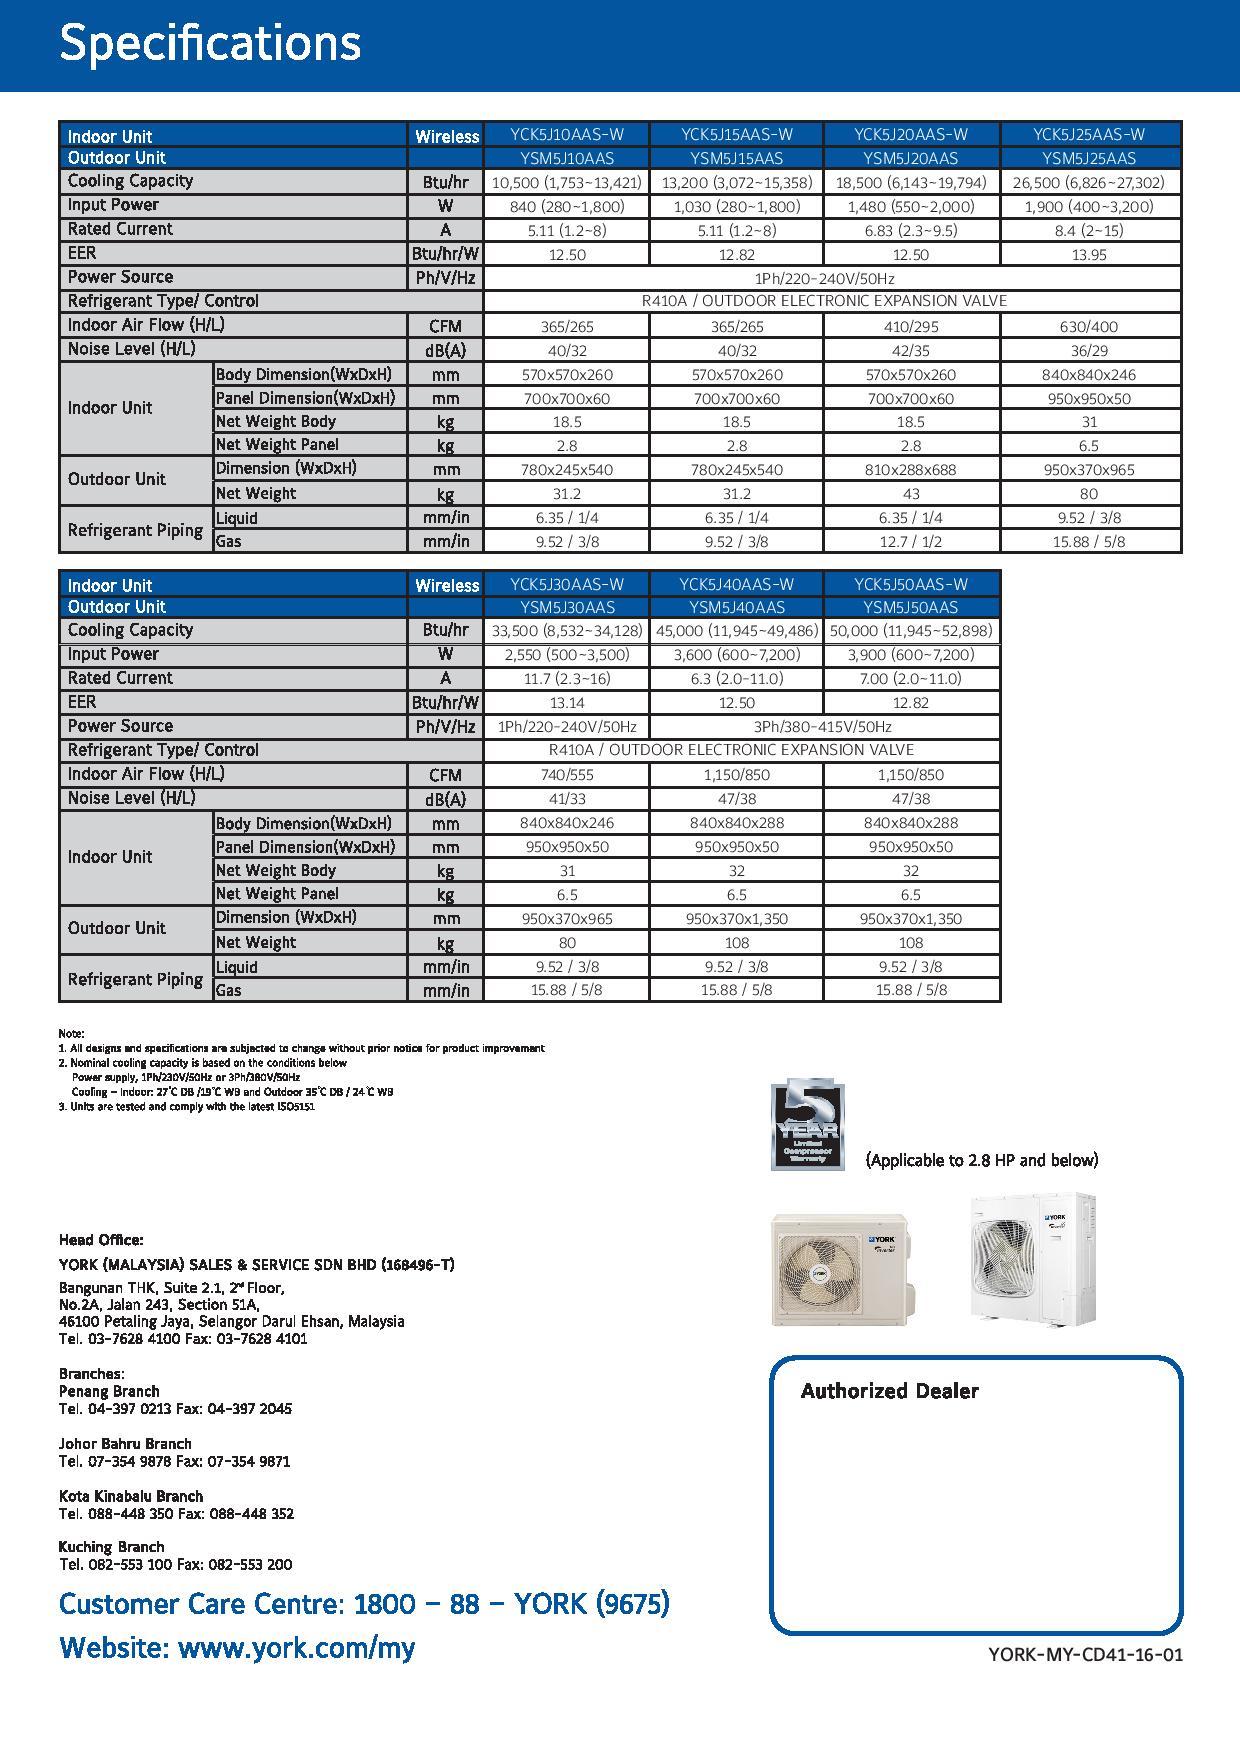 4.Cassette Premium Inverter R410A (1)-page-001